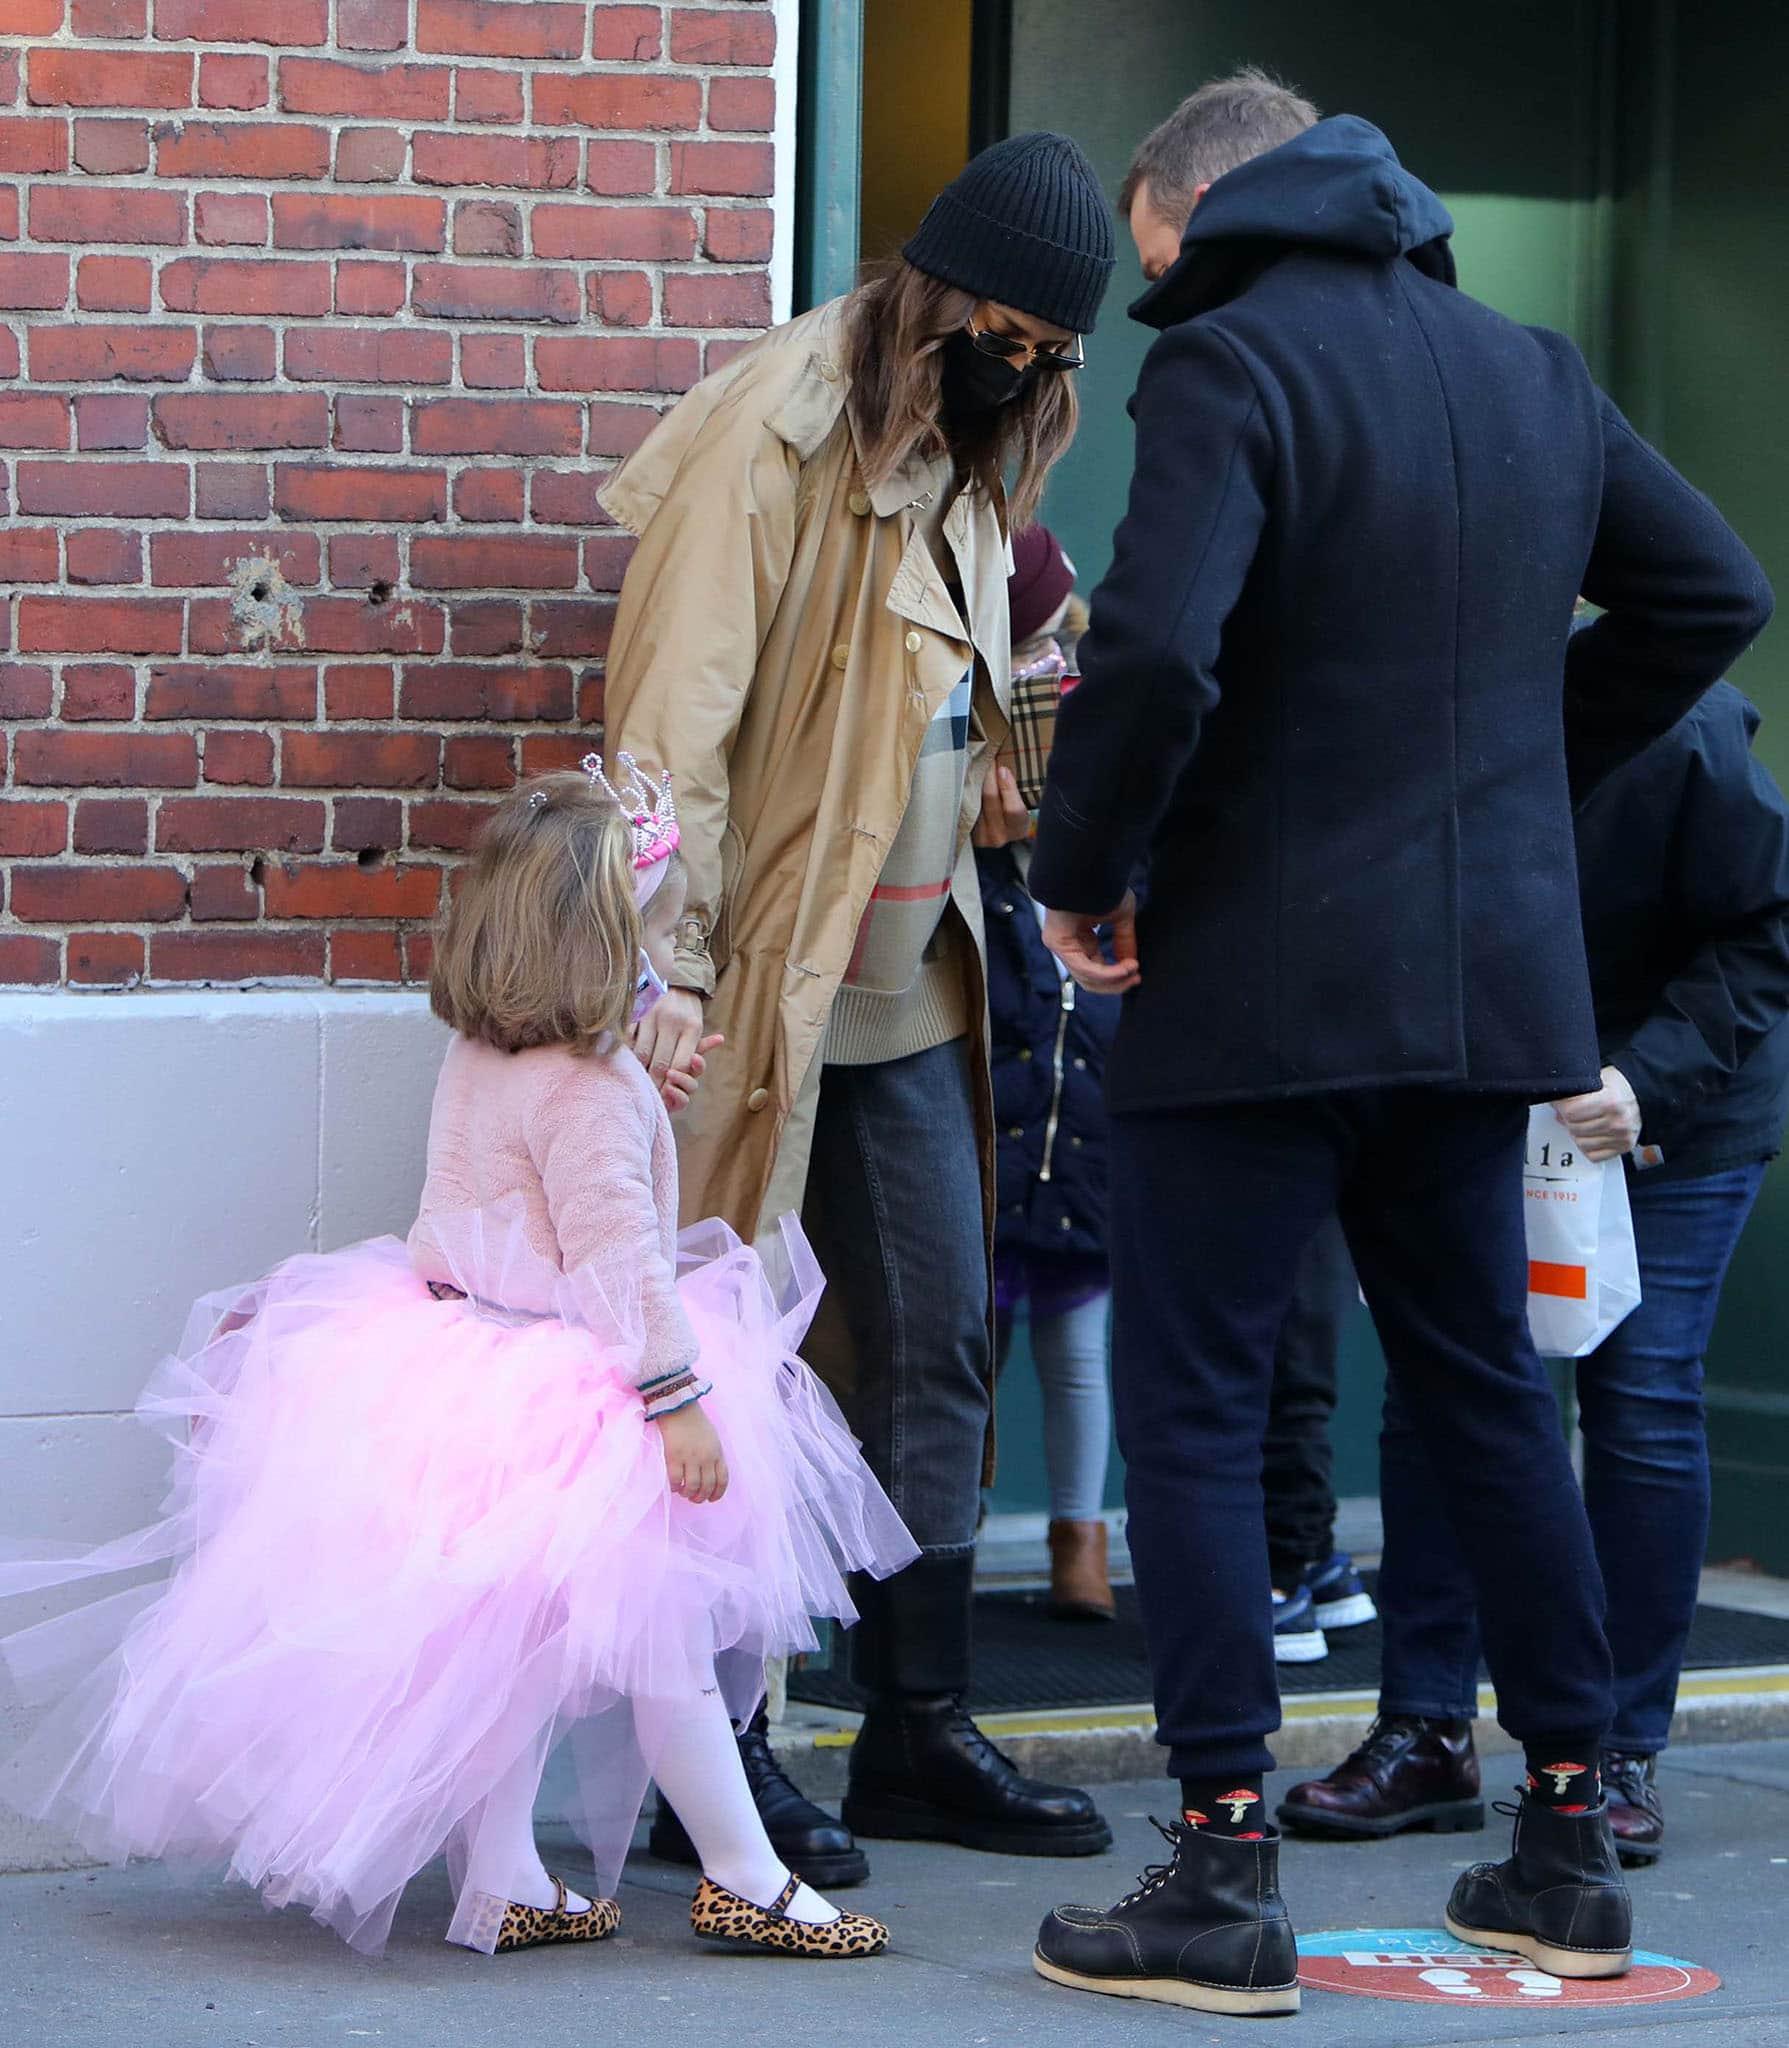 Irina Shayk and ex Bradley Cooper take their child, Lea de Seine, to school in New York City on March 19, 2021